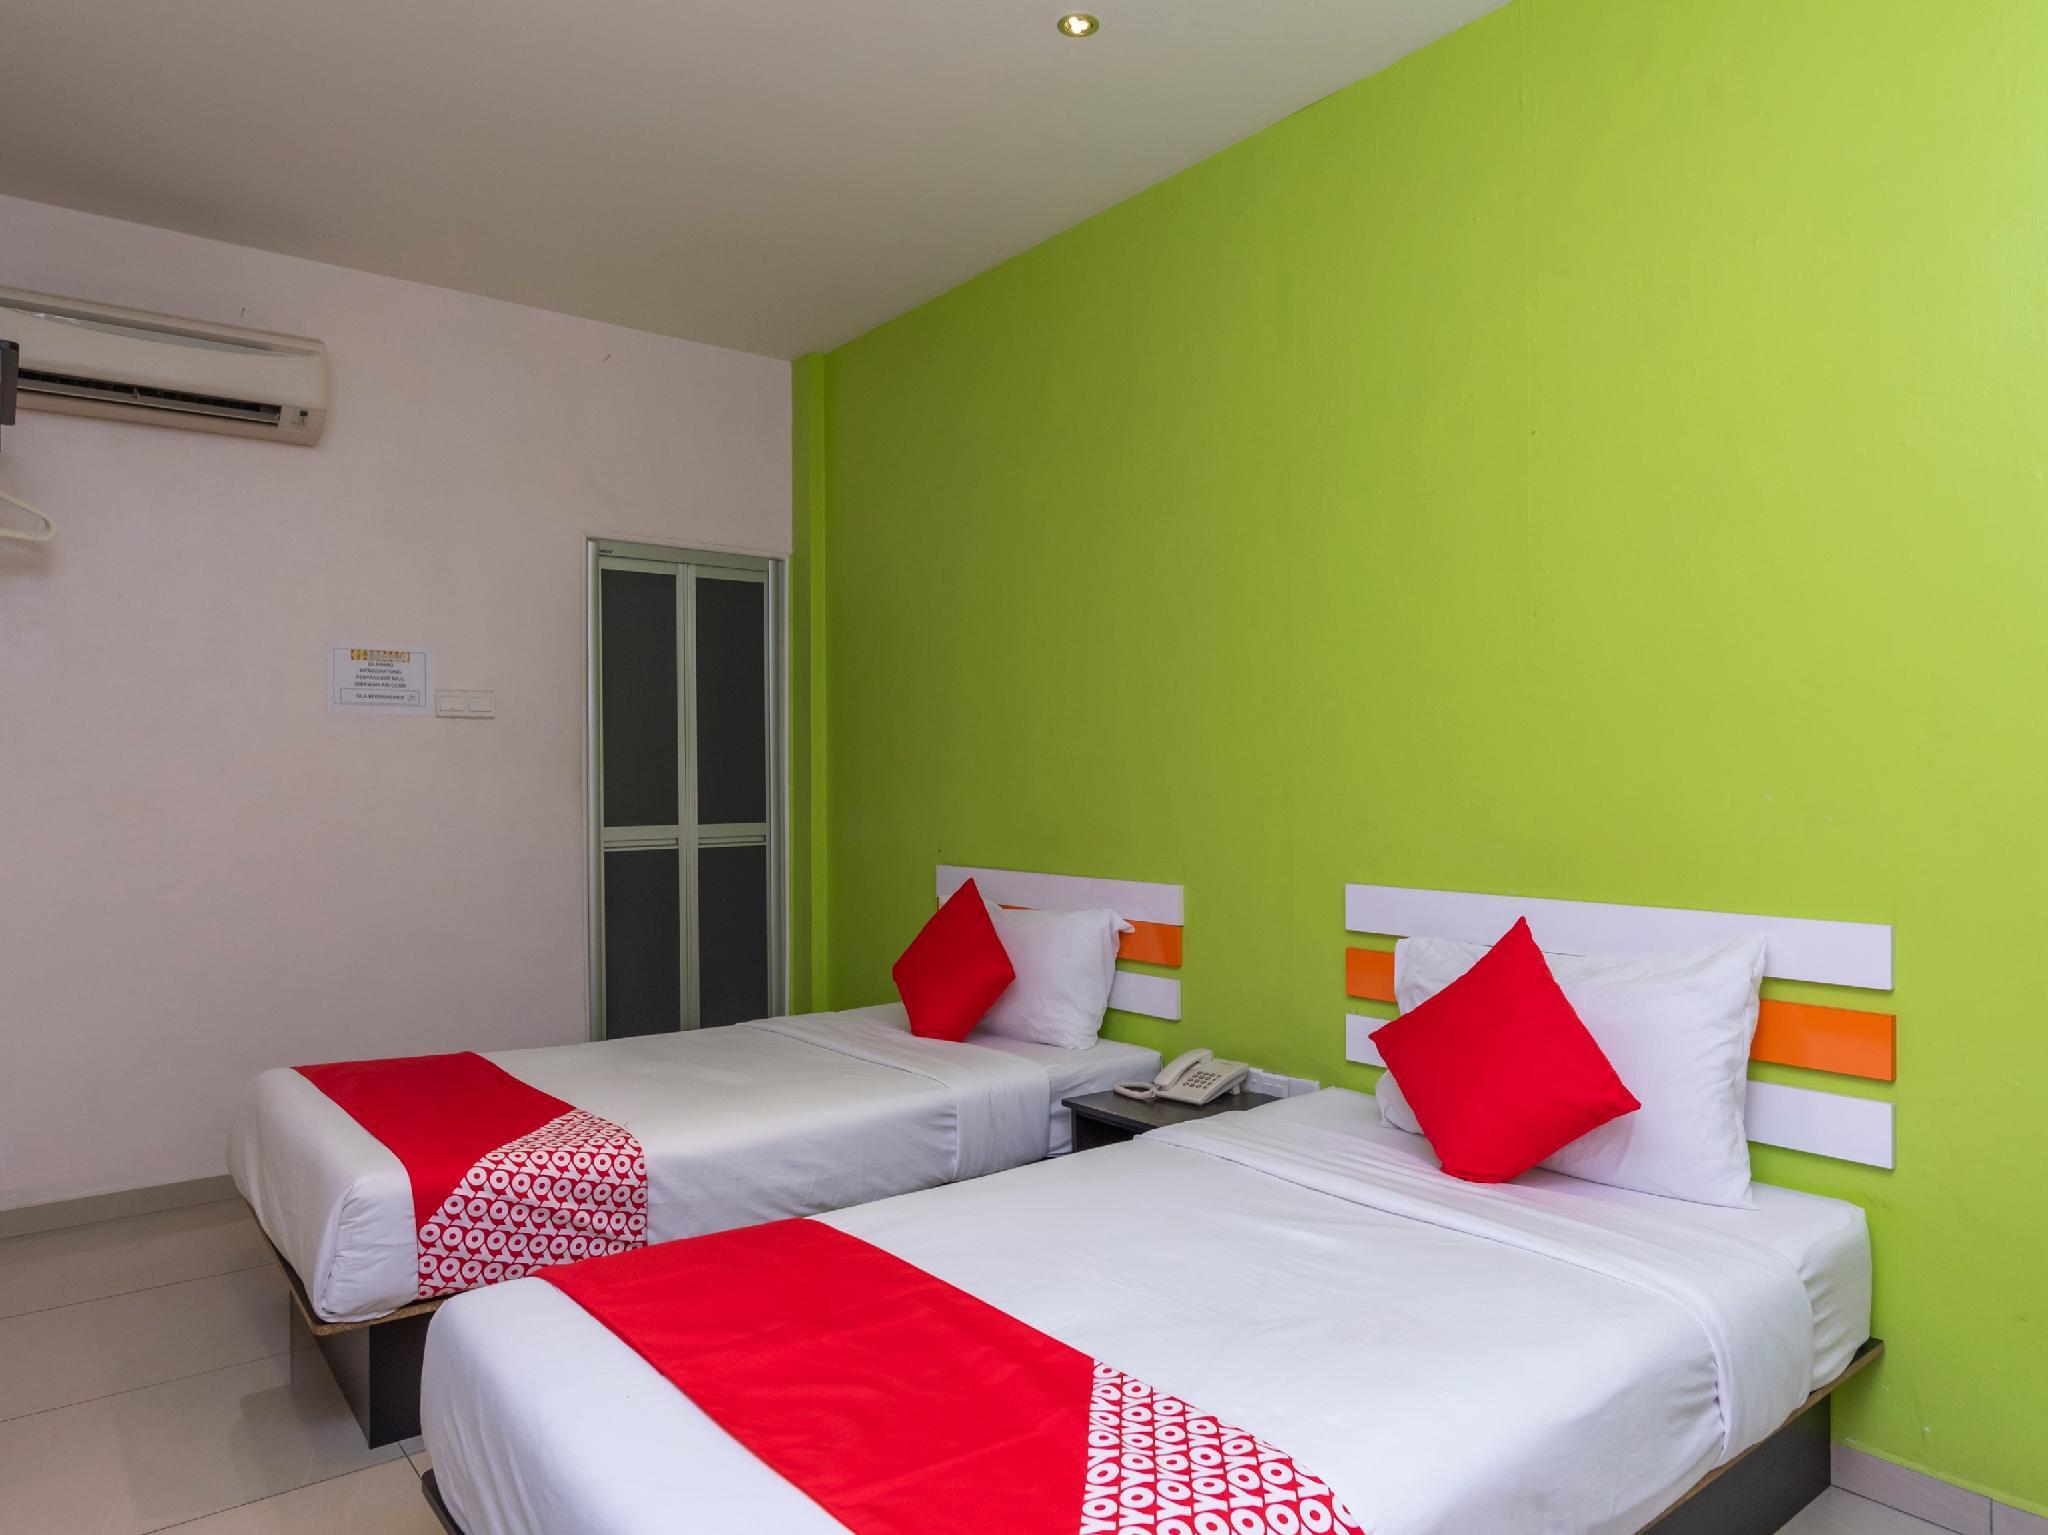 OYO 966 Segamat Red Orange Hotel Sdn Bhd